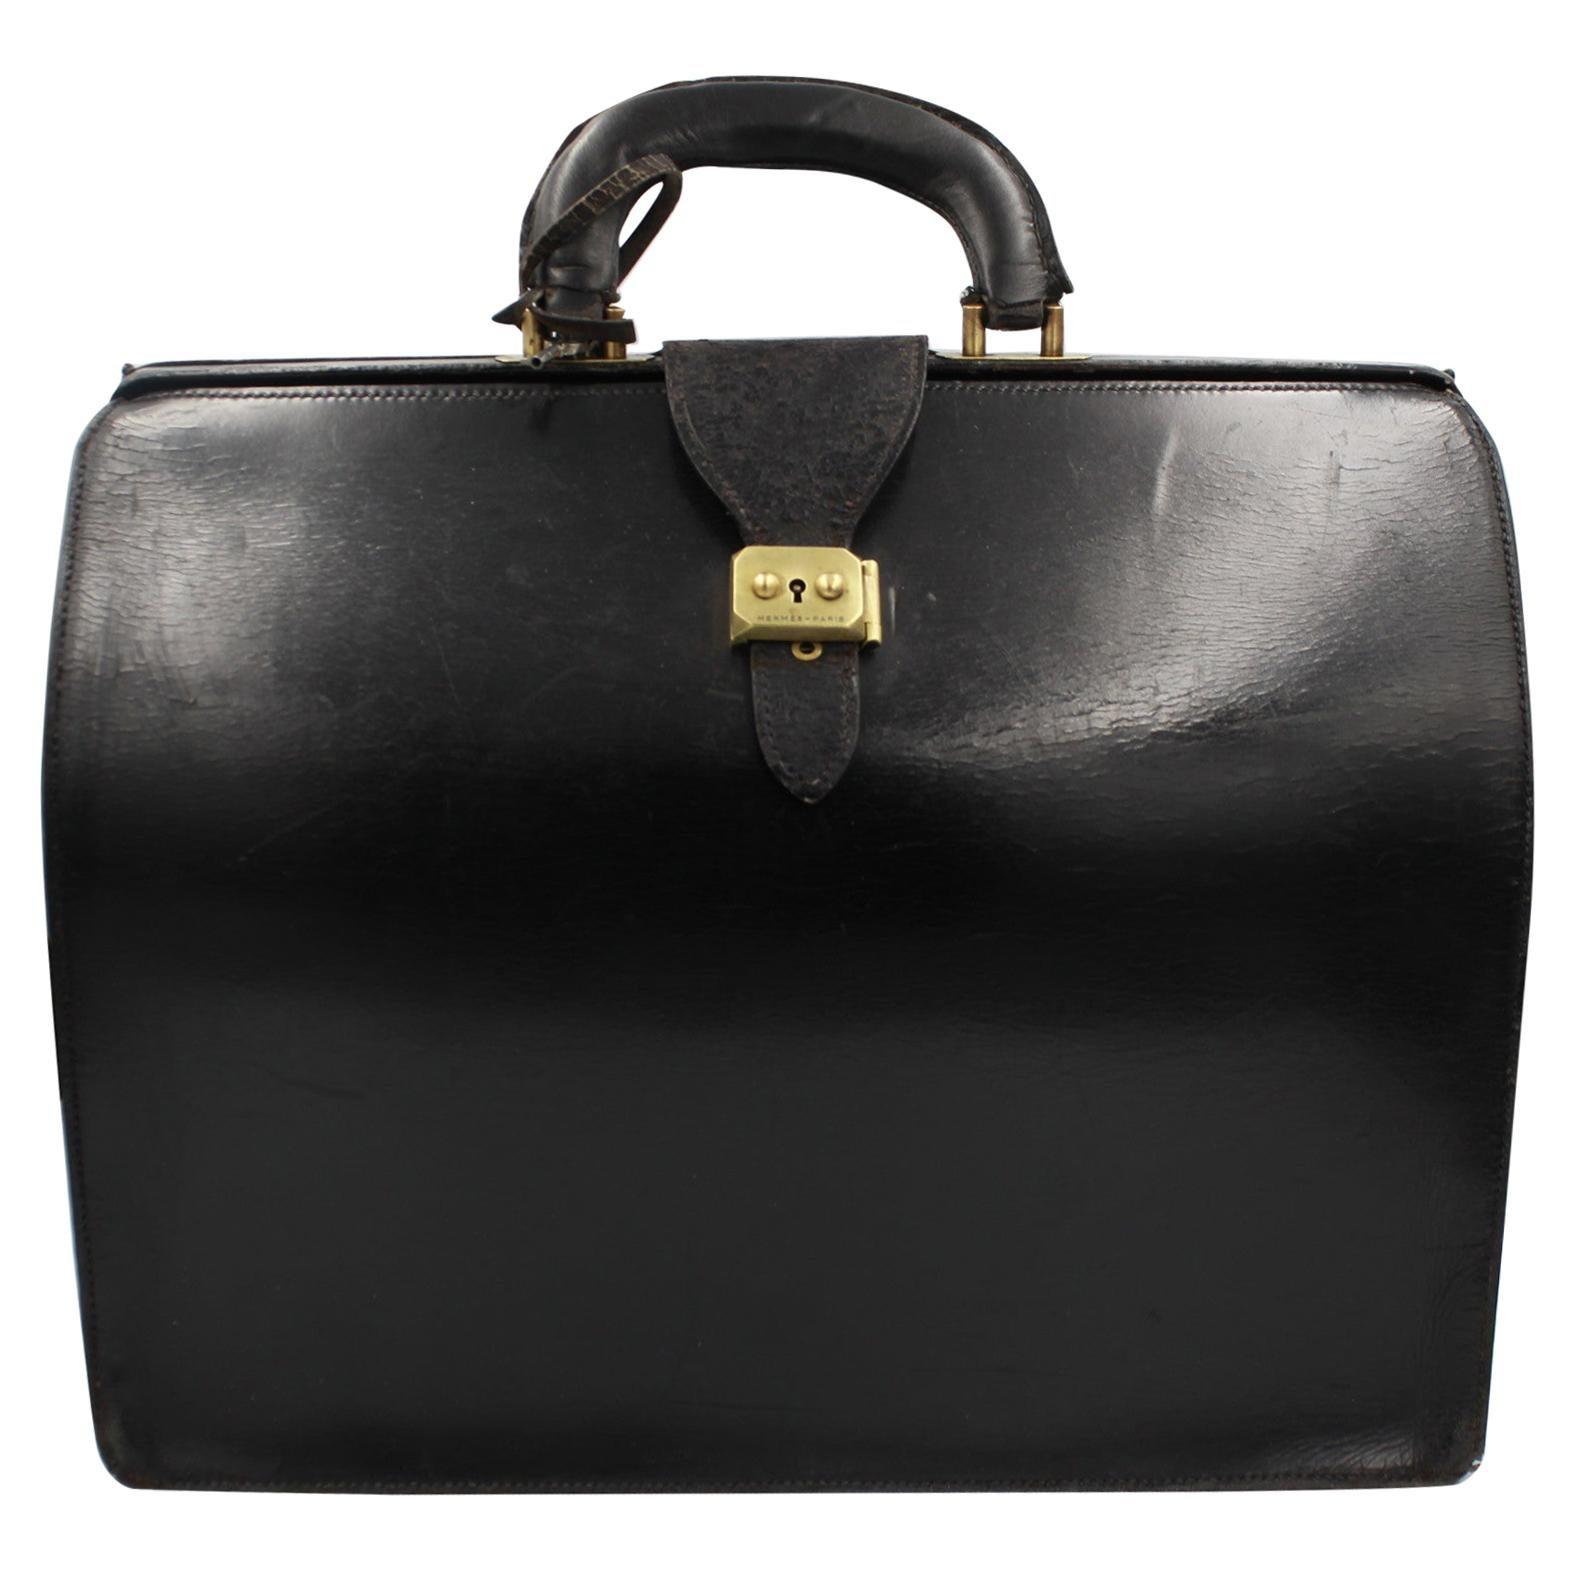 eea3eec7980c0 1960s Handbags and Purses - 315 For Sale at 1stdibs